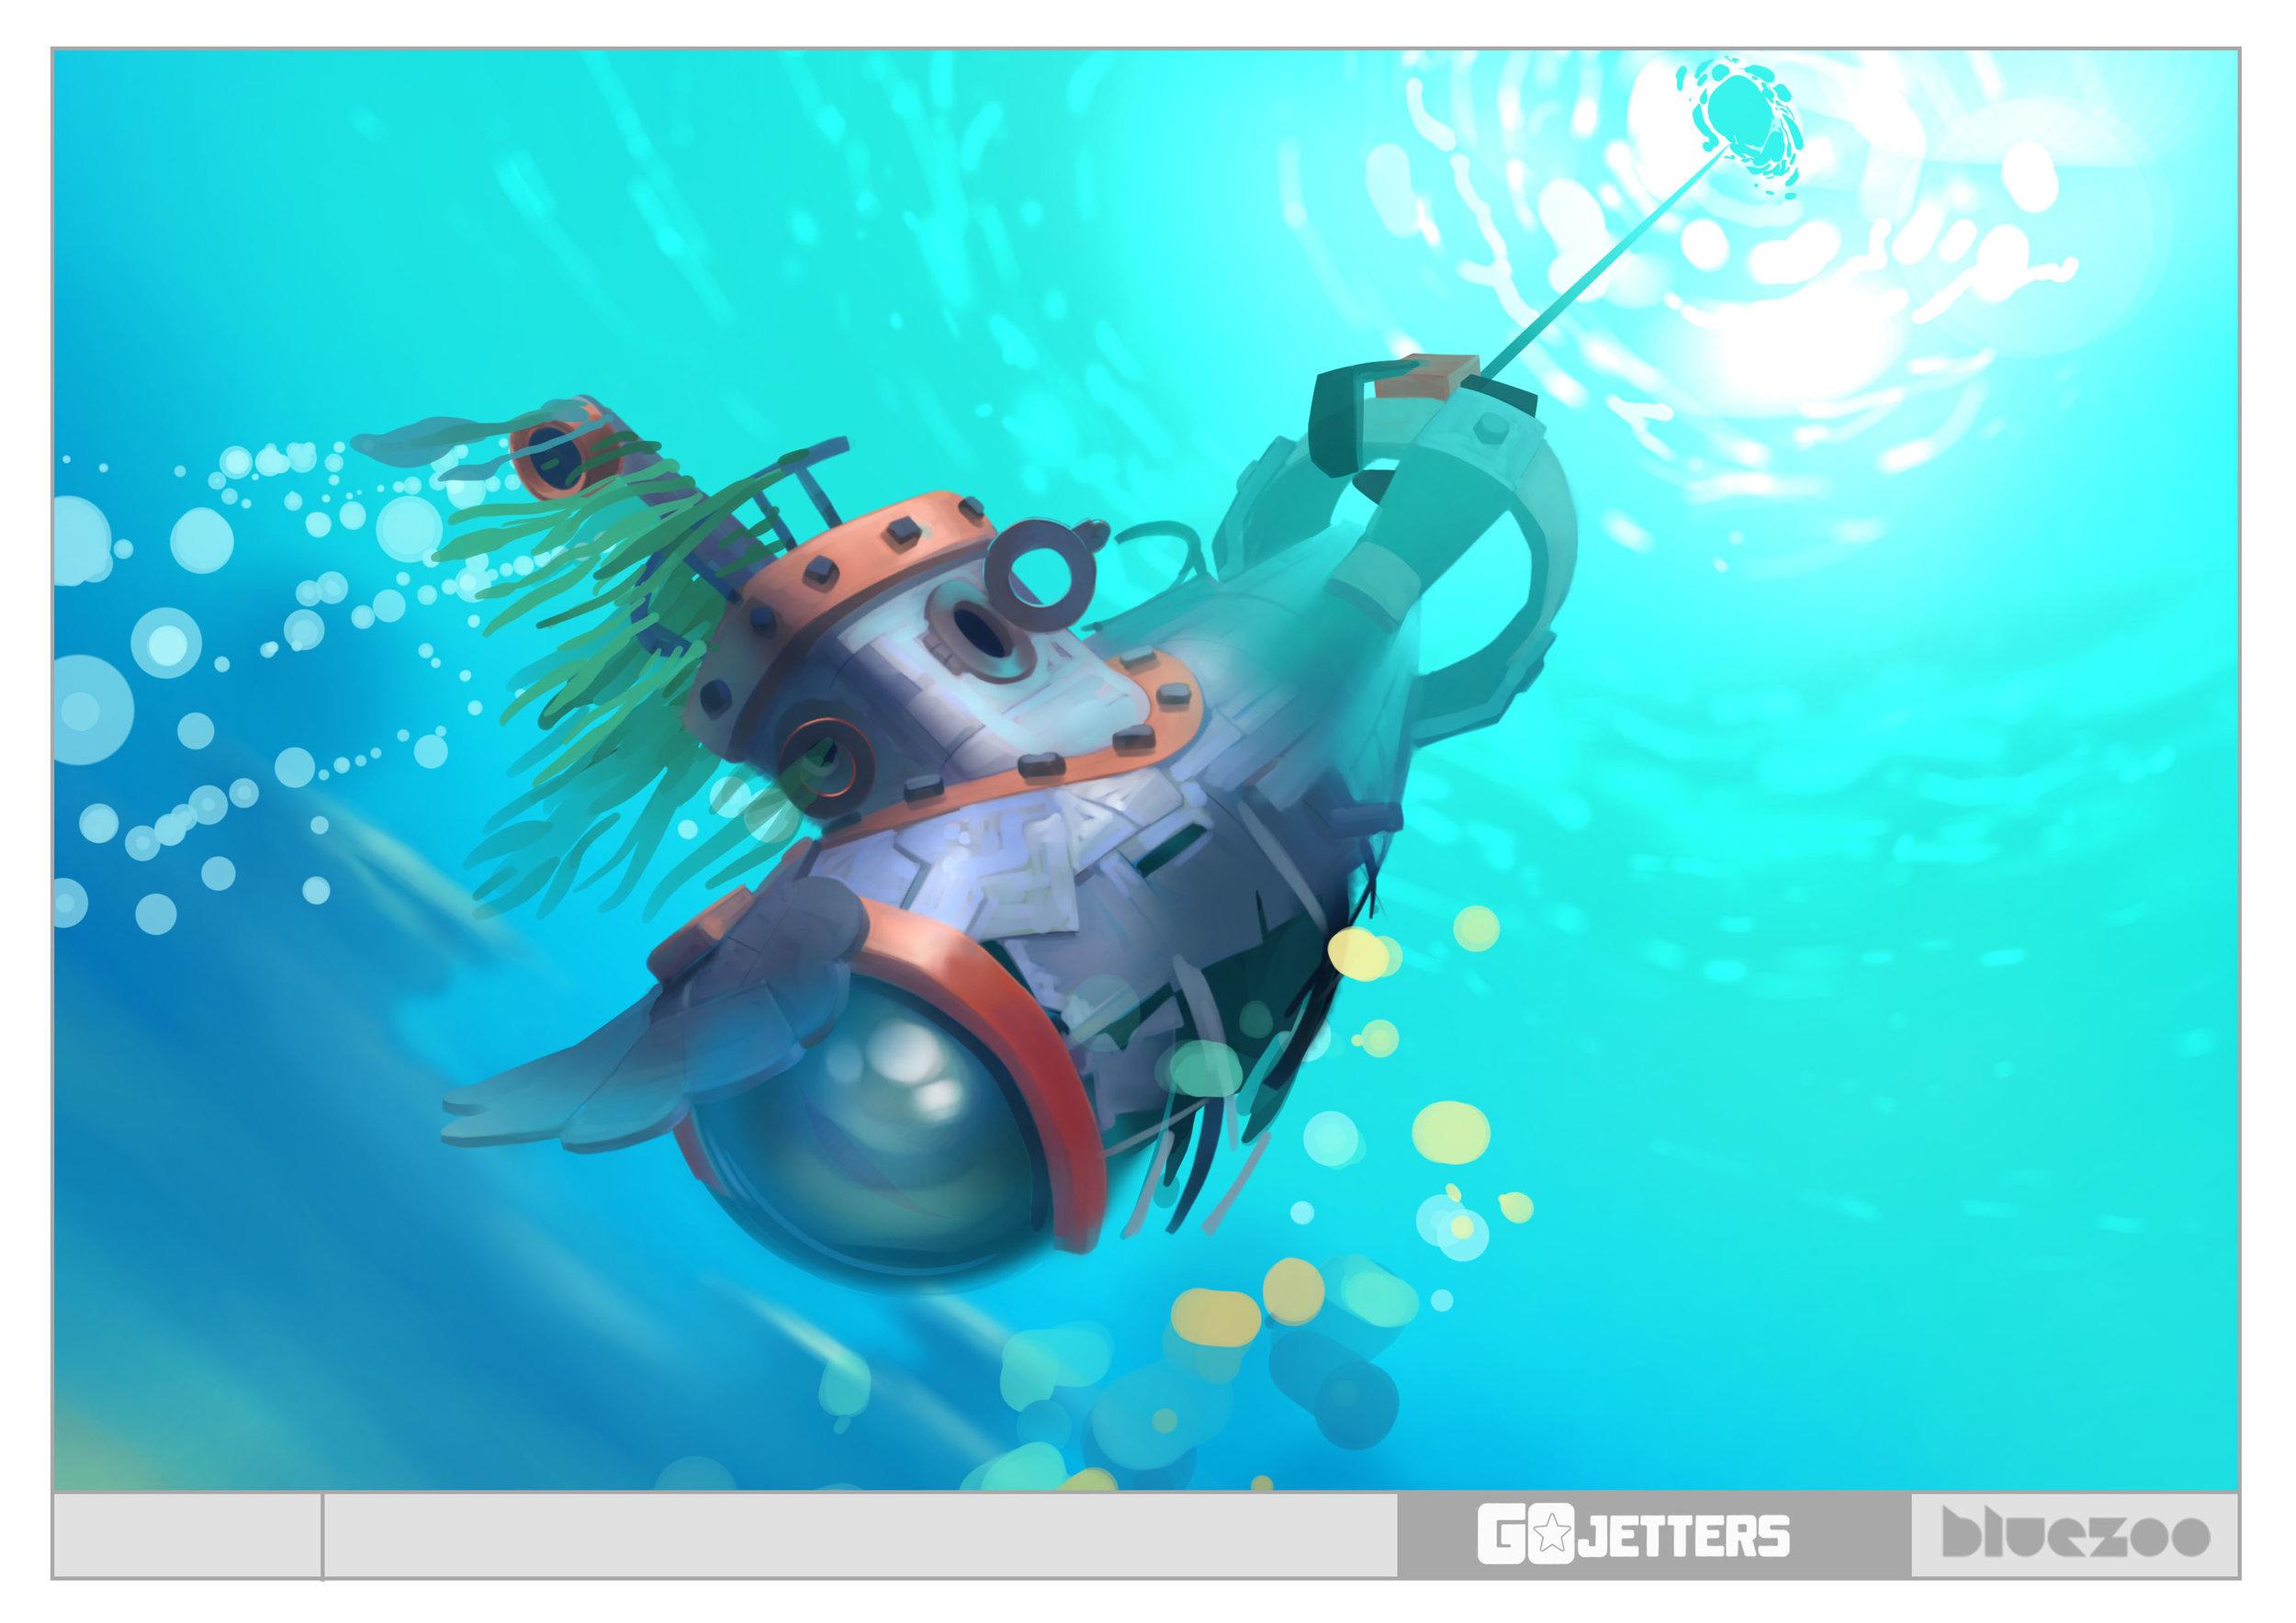 ShipWreck_BBCPicture_02.jpg